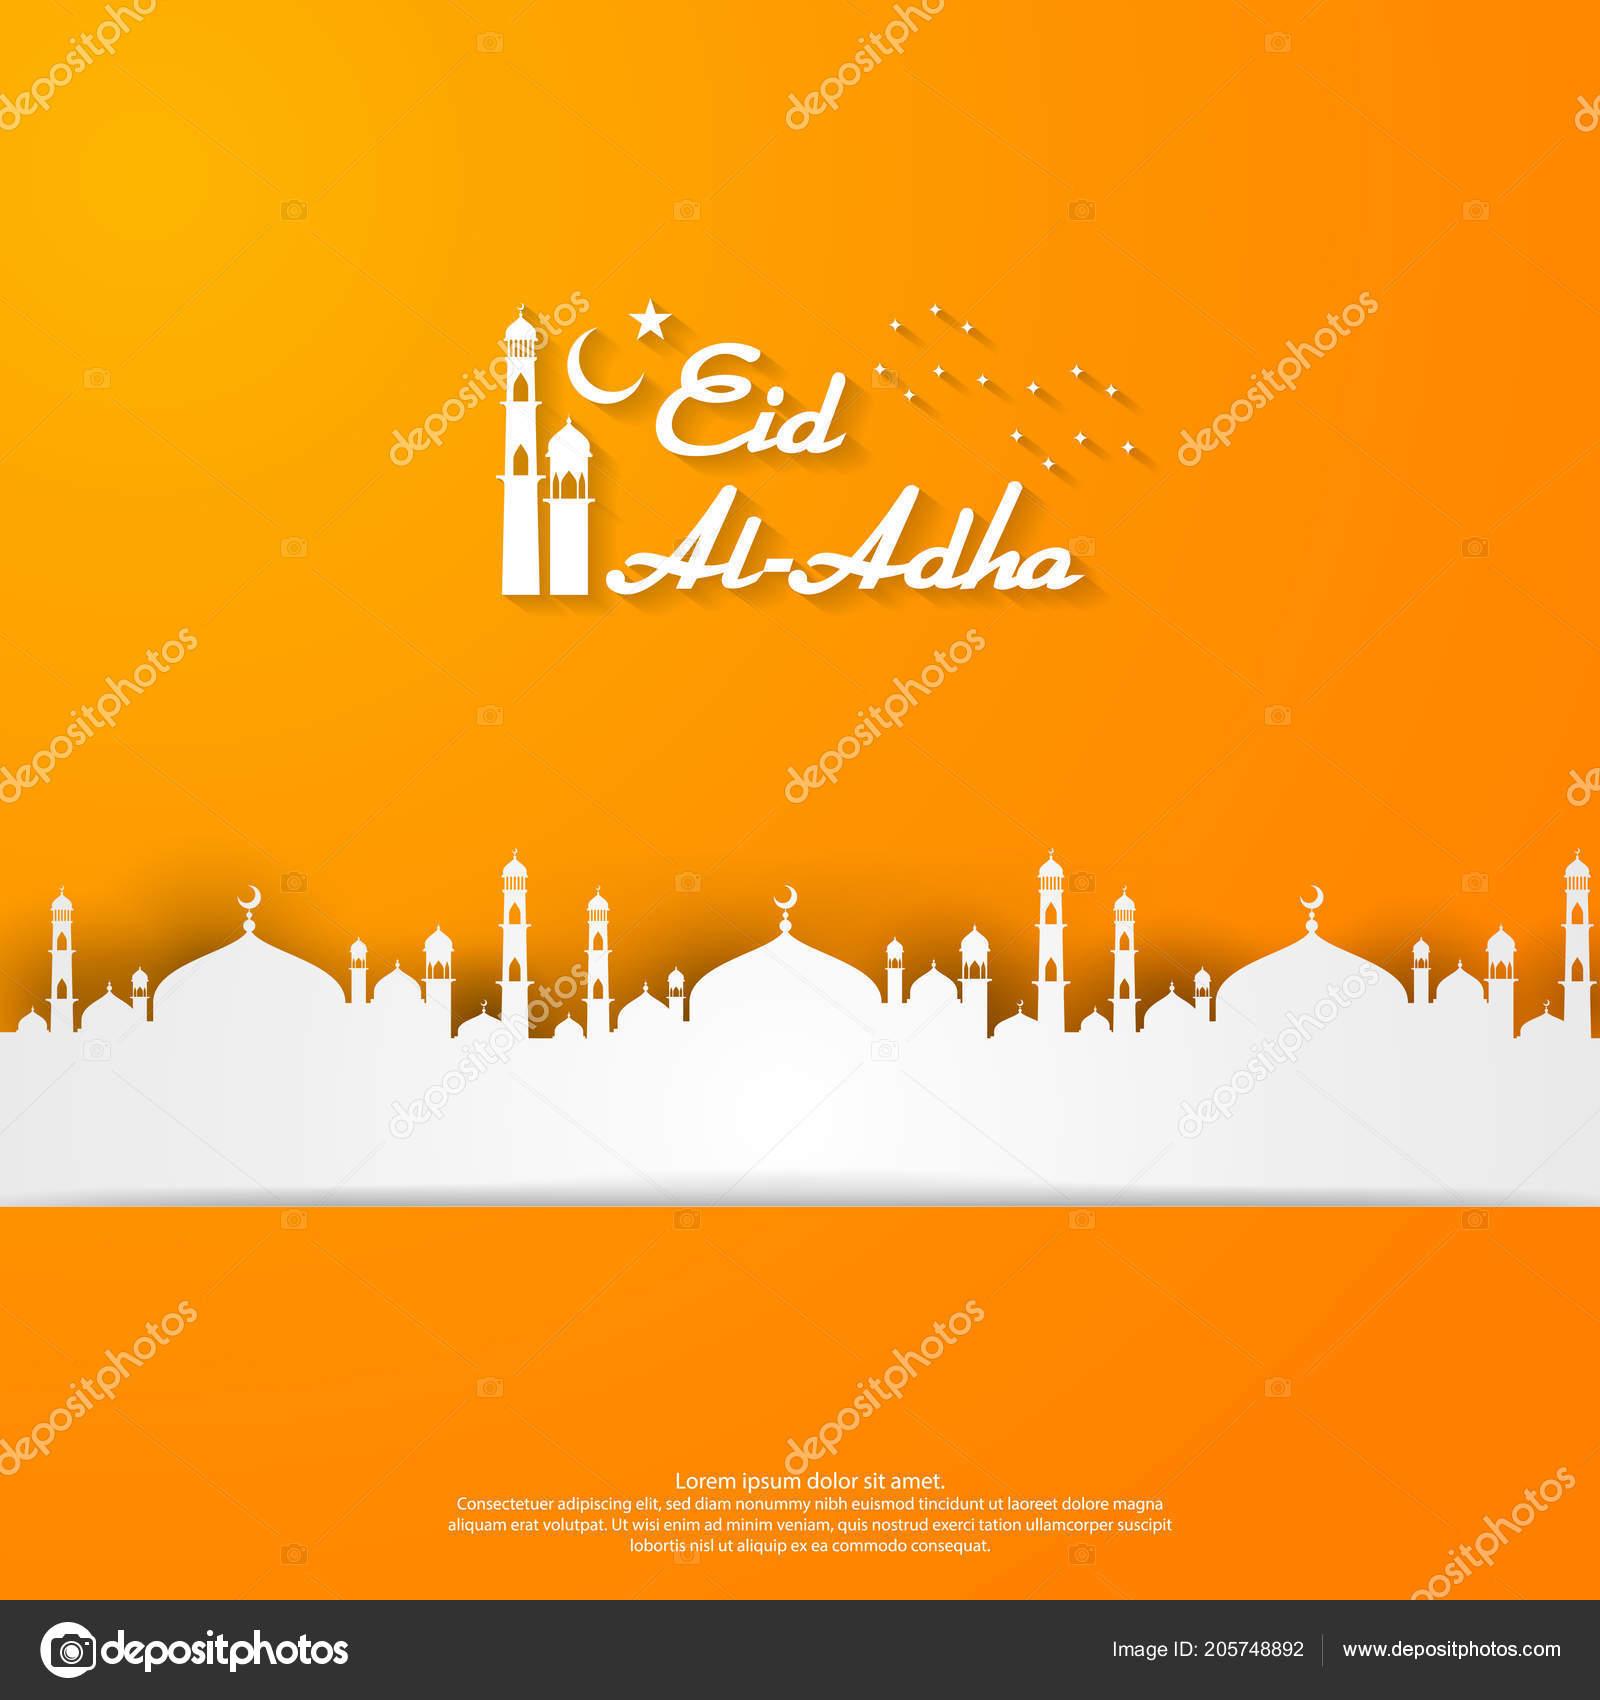 Eid adha mubarak islamic greeting card design dome mosque element eid adha mubarak islamic greeting card design dome mosque element stock vector m4hsunfo